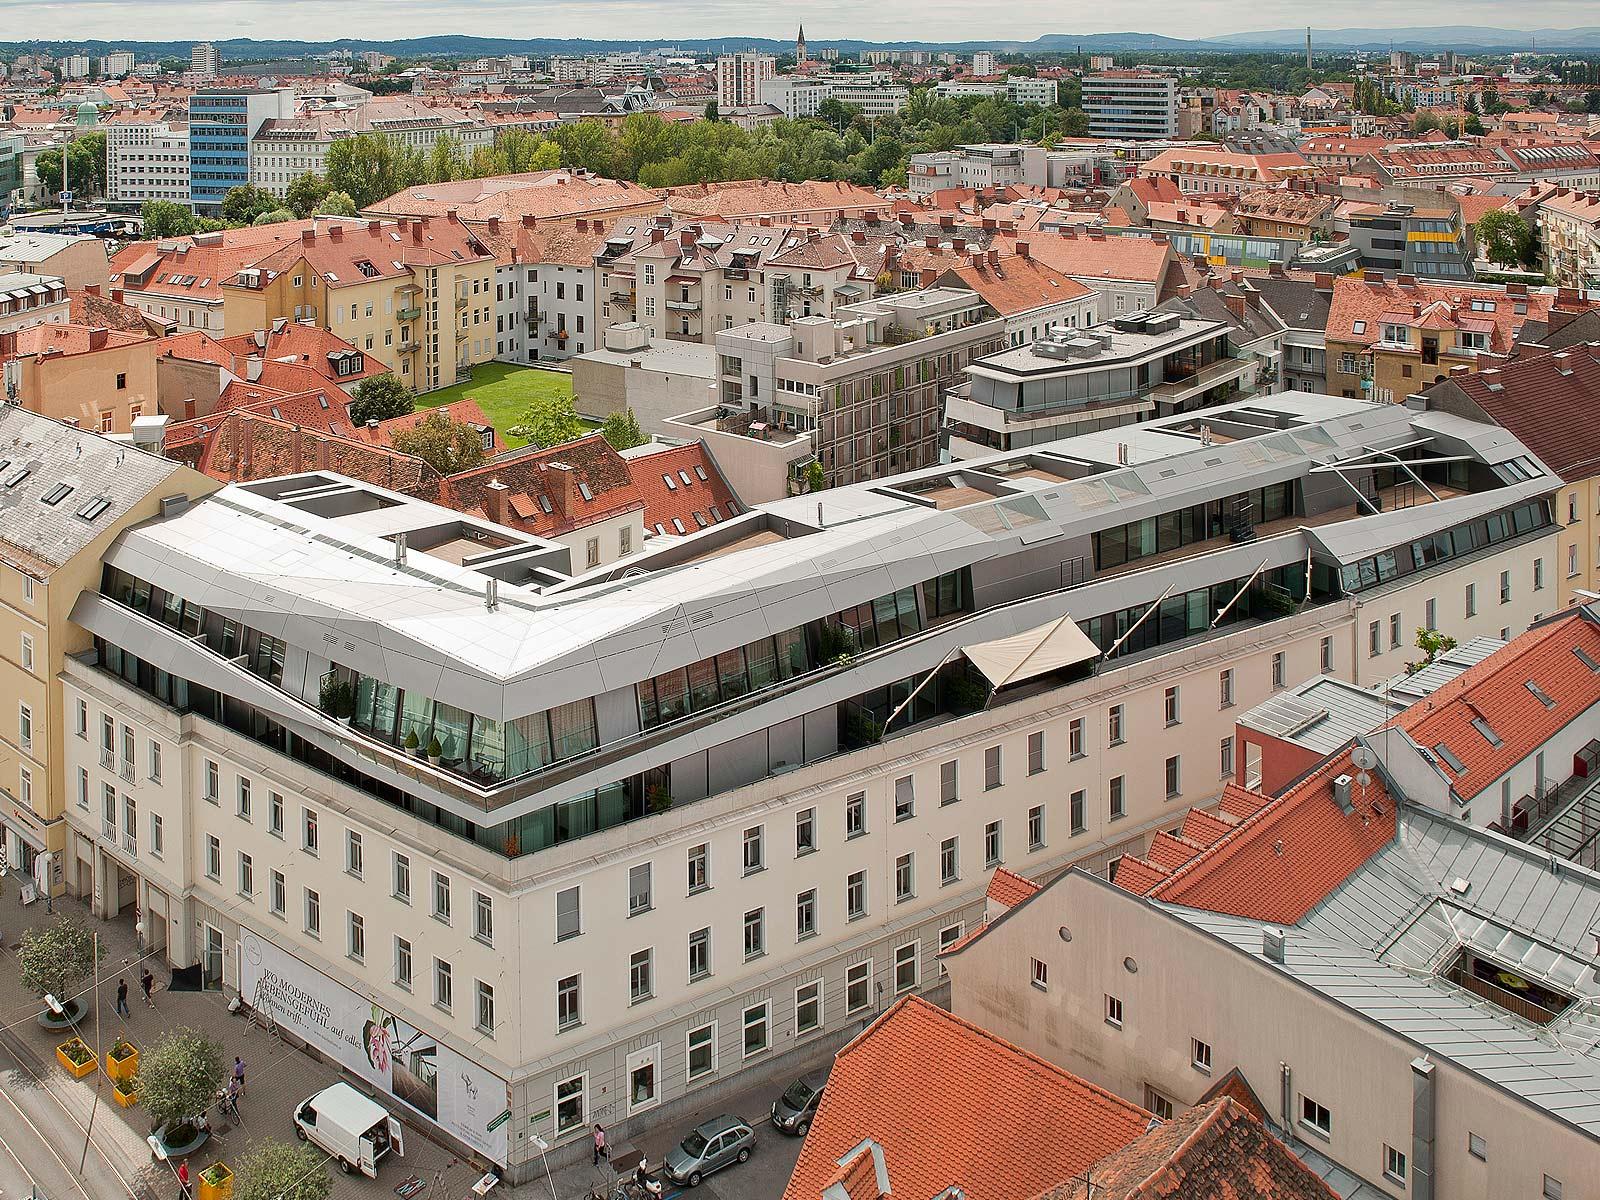 Best architects architektur award architekten domenig for Studium zum architekten